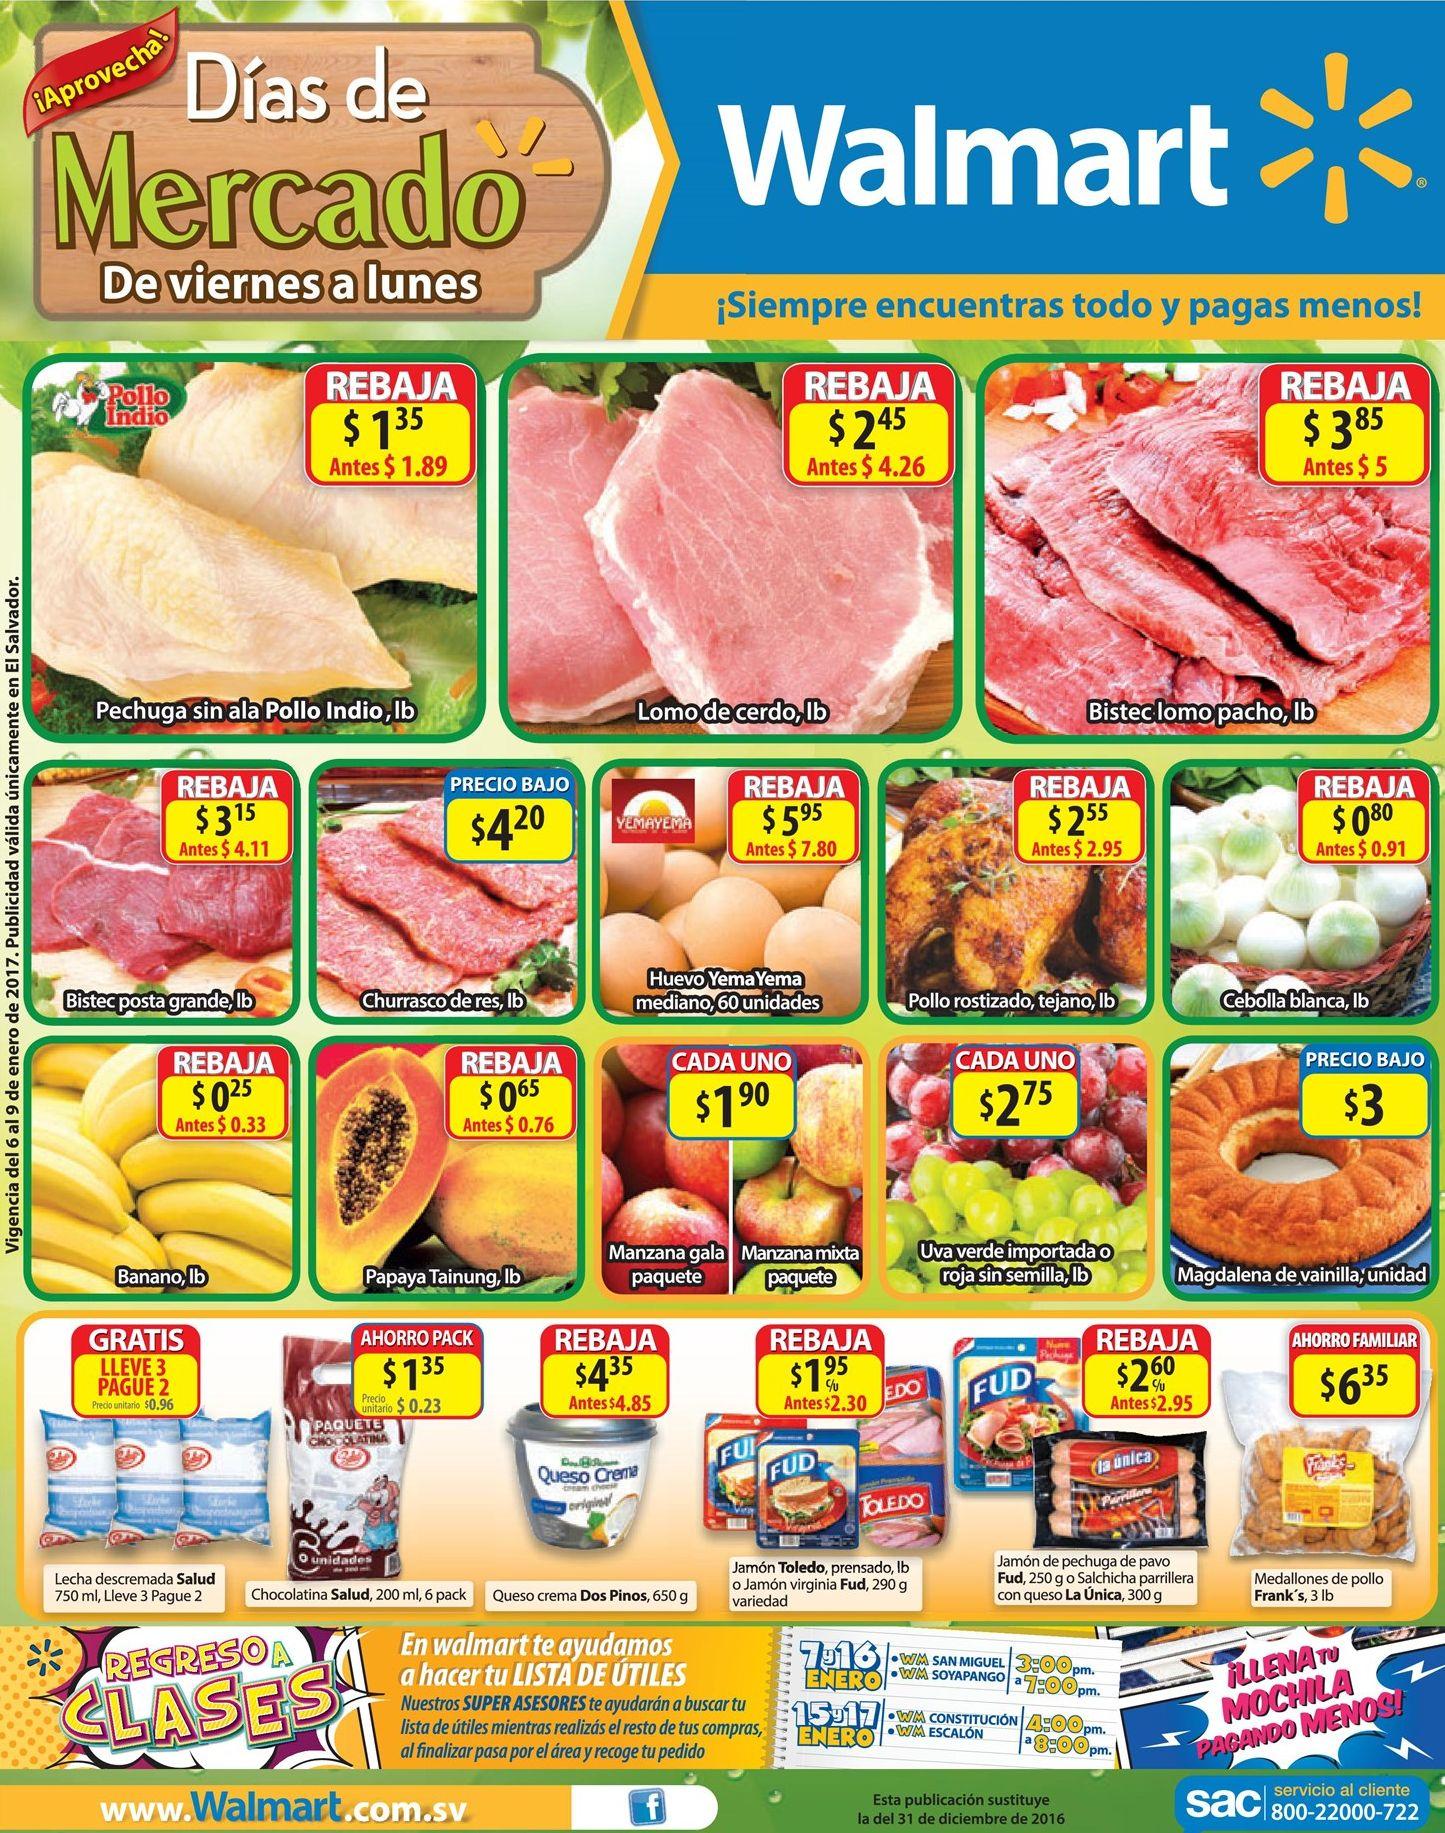 dia-de-compra-en-mercado-walmart-a-buenos-precios-06ene17